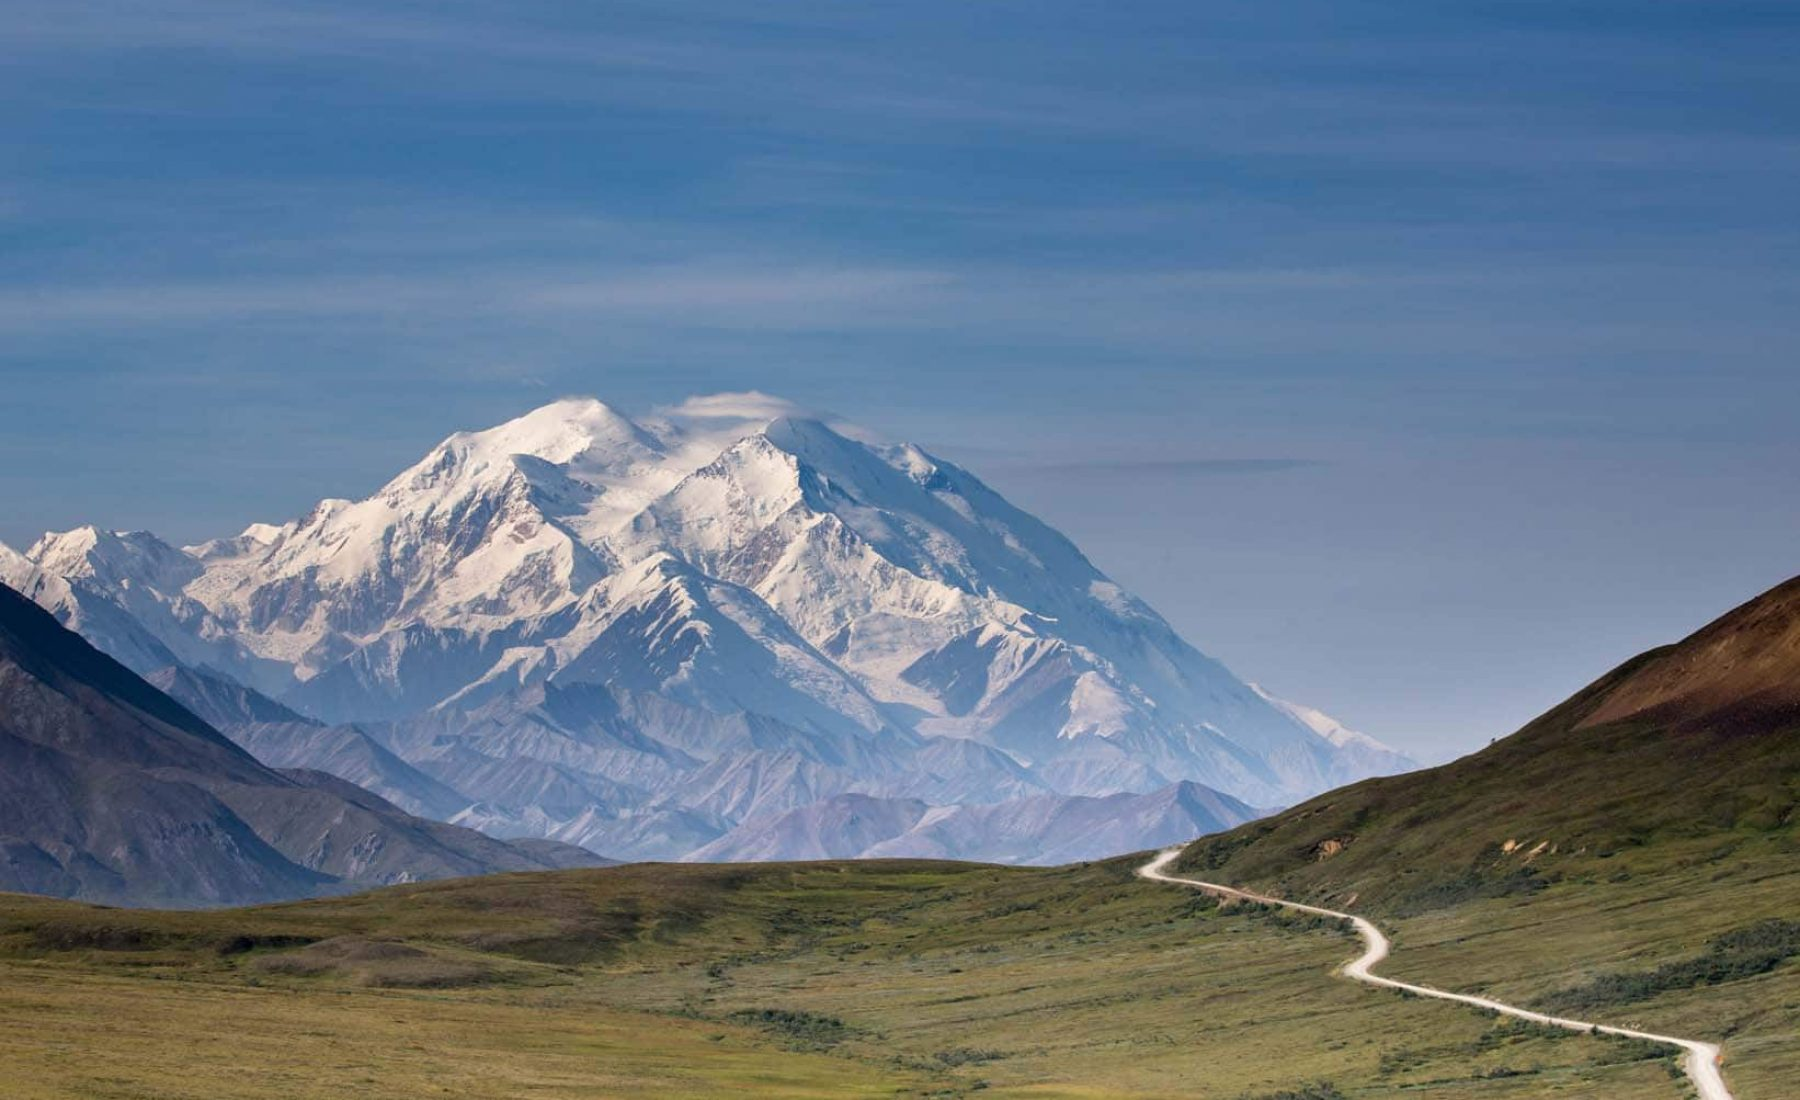 Alaska Day 6: Denali Backcountry Adventure